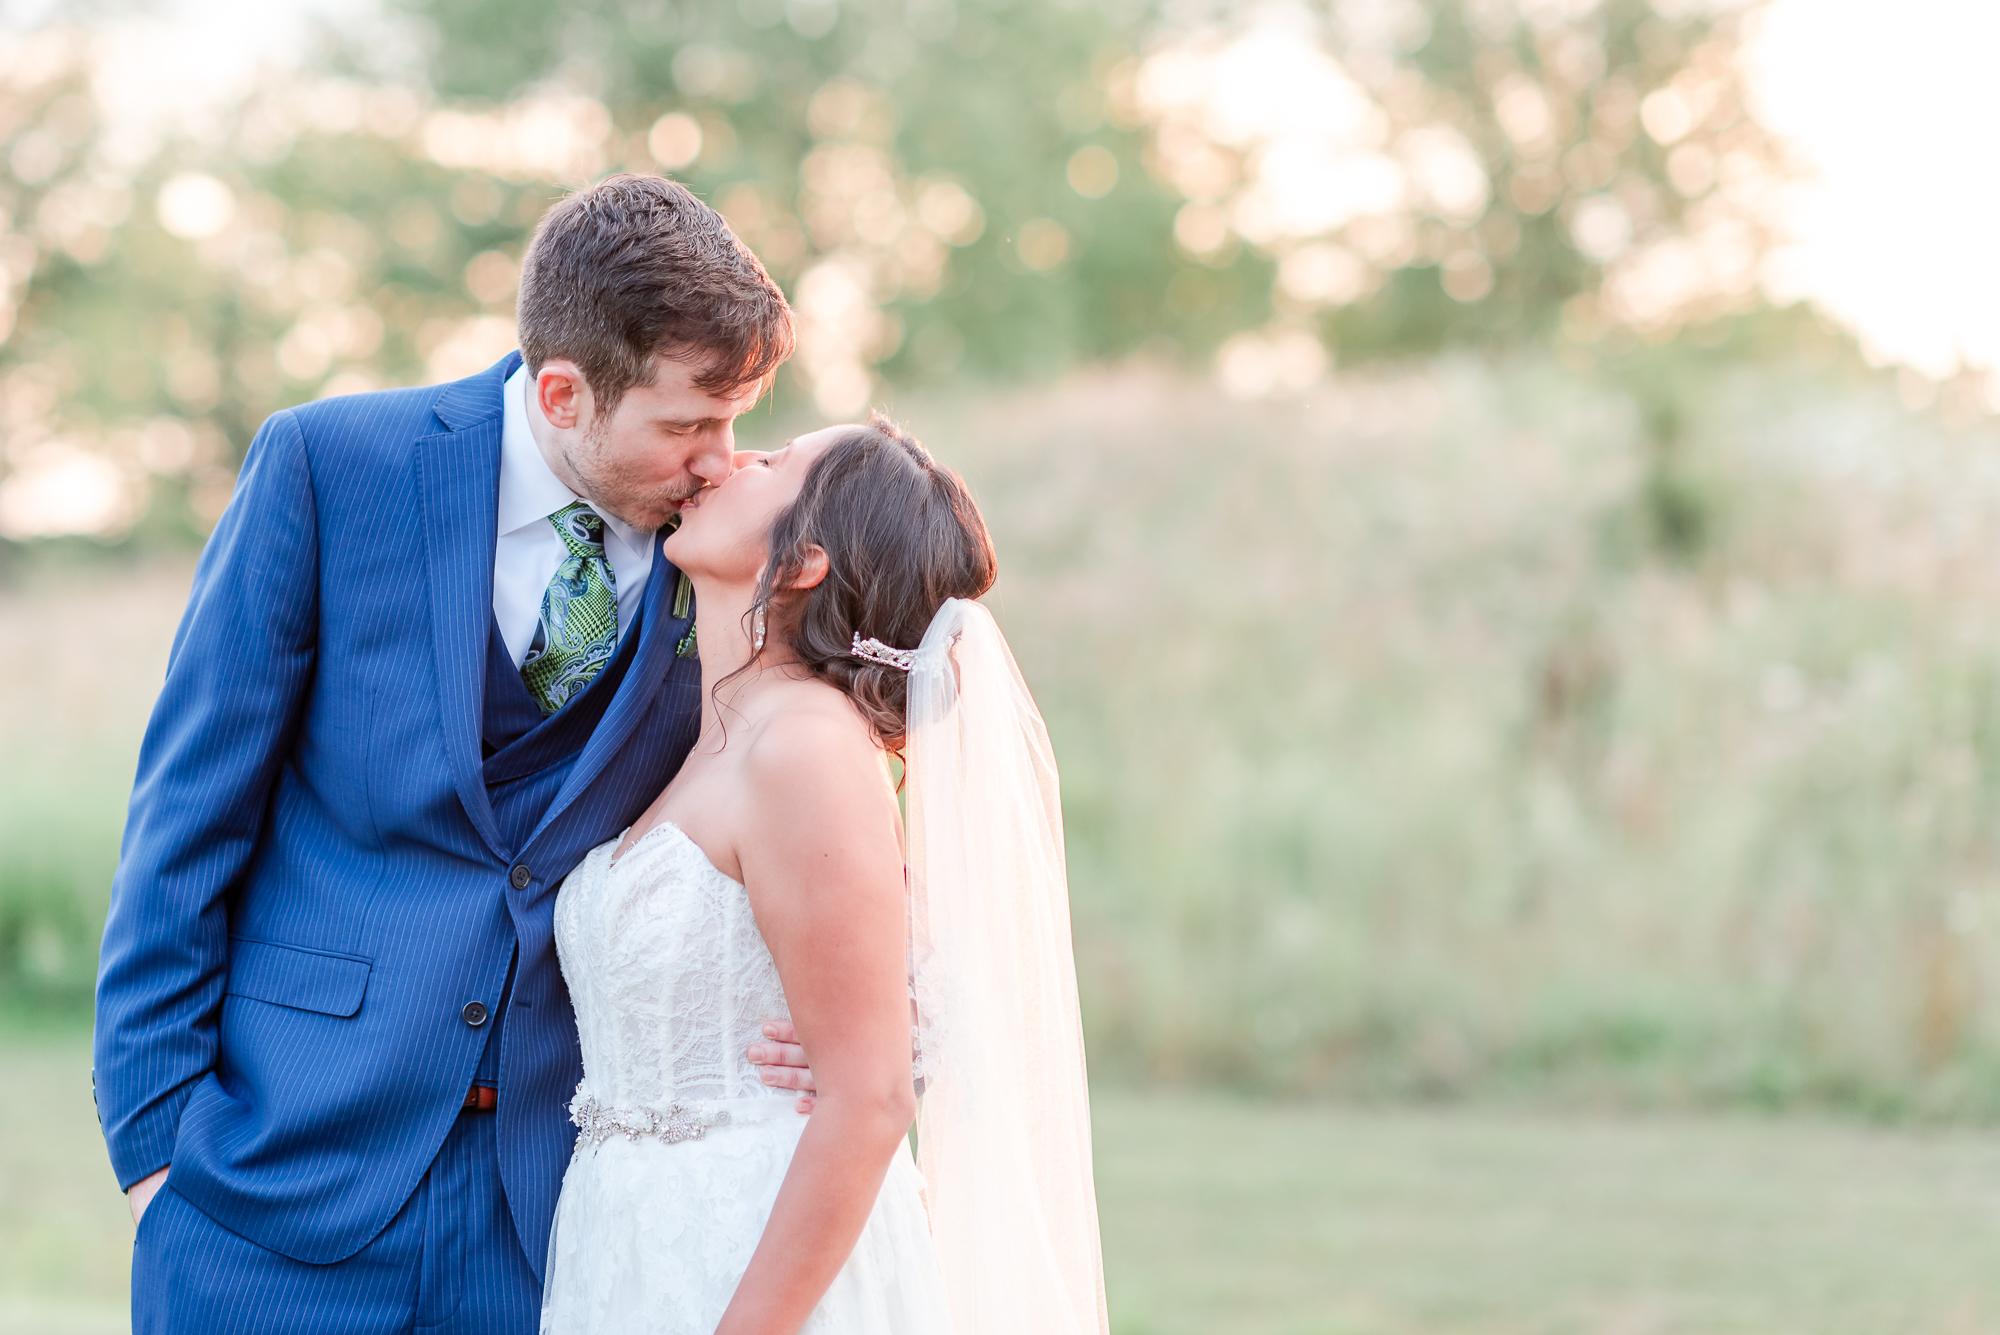 Maria+Adam_Summer Barn Wedding_The Barn and The North Star Preserve_Oberlin_Ohio-151.jpg